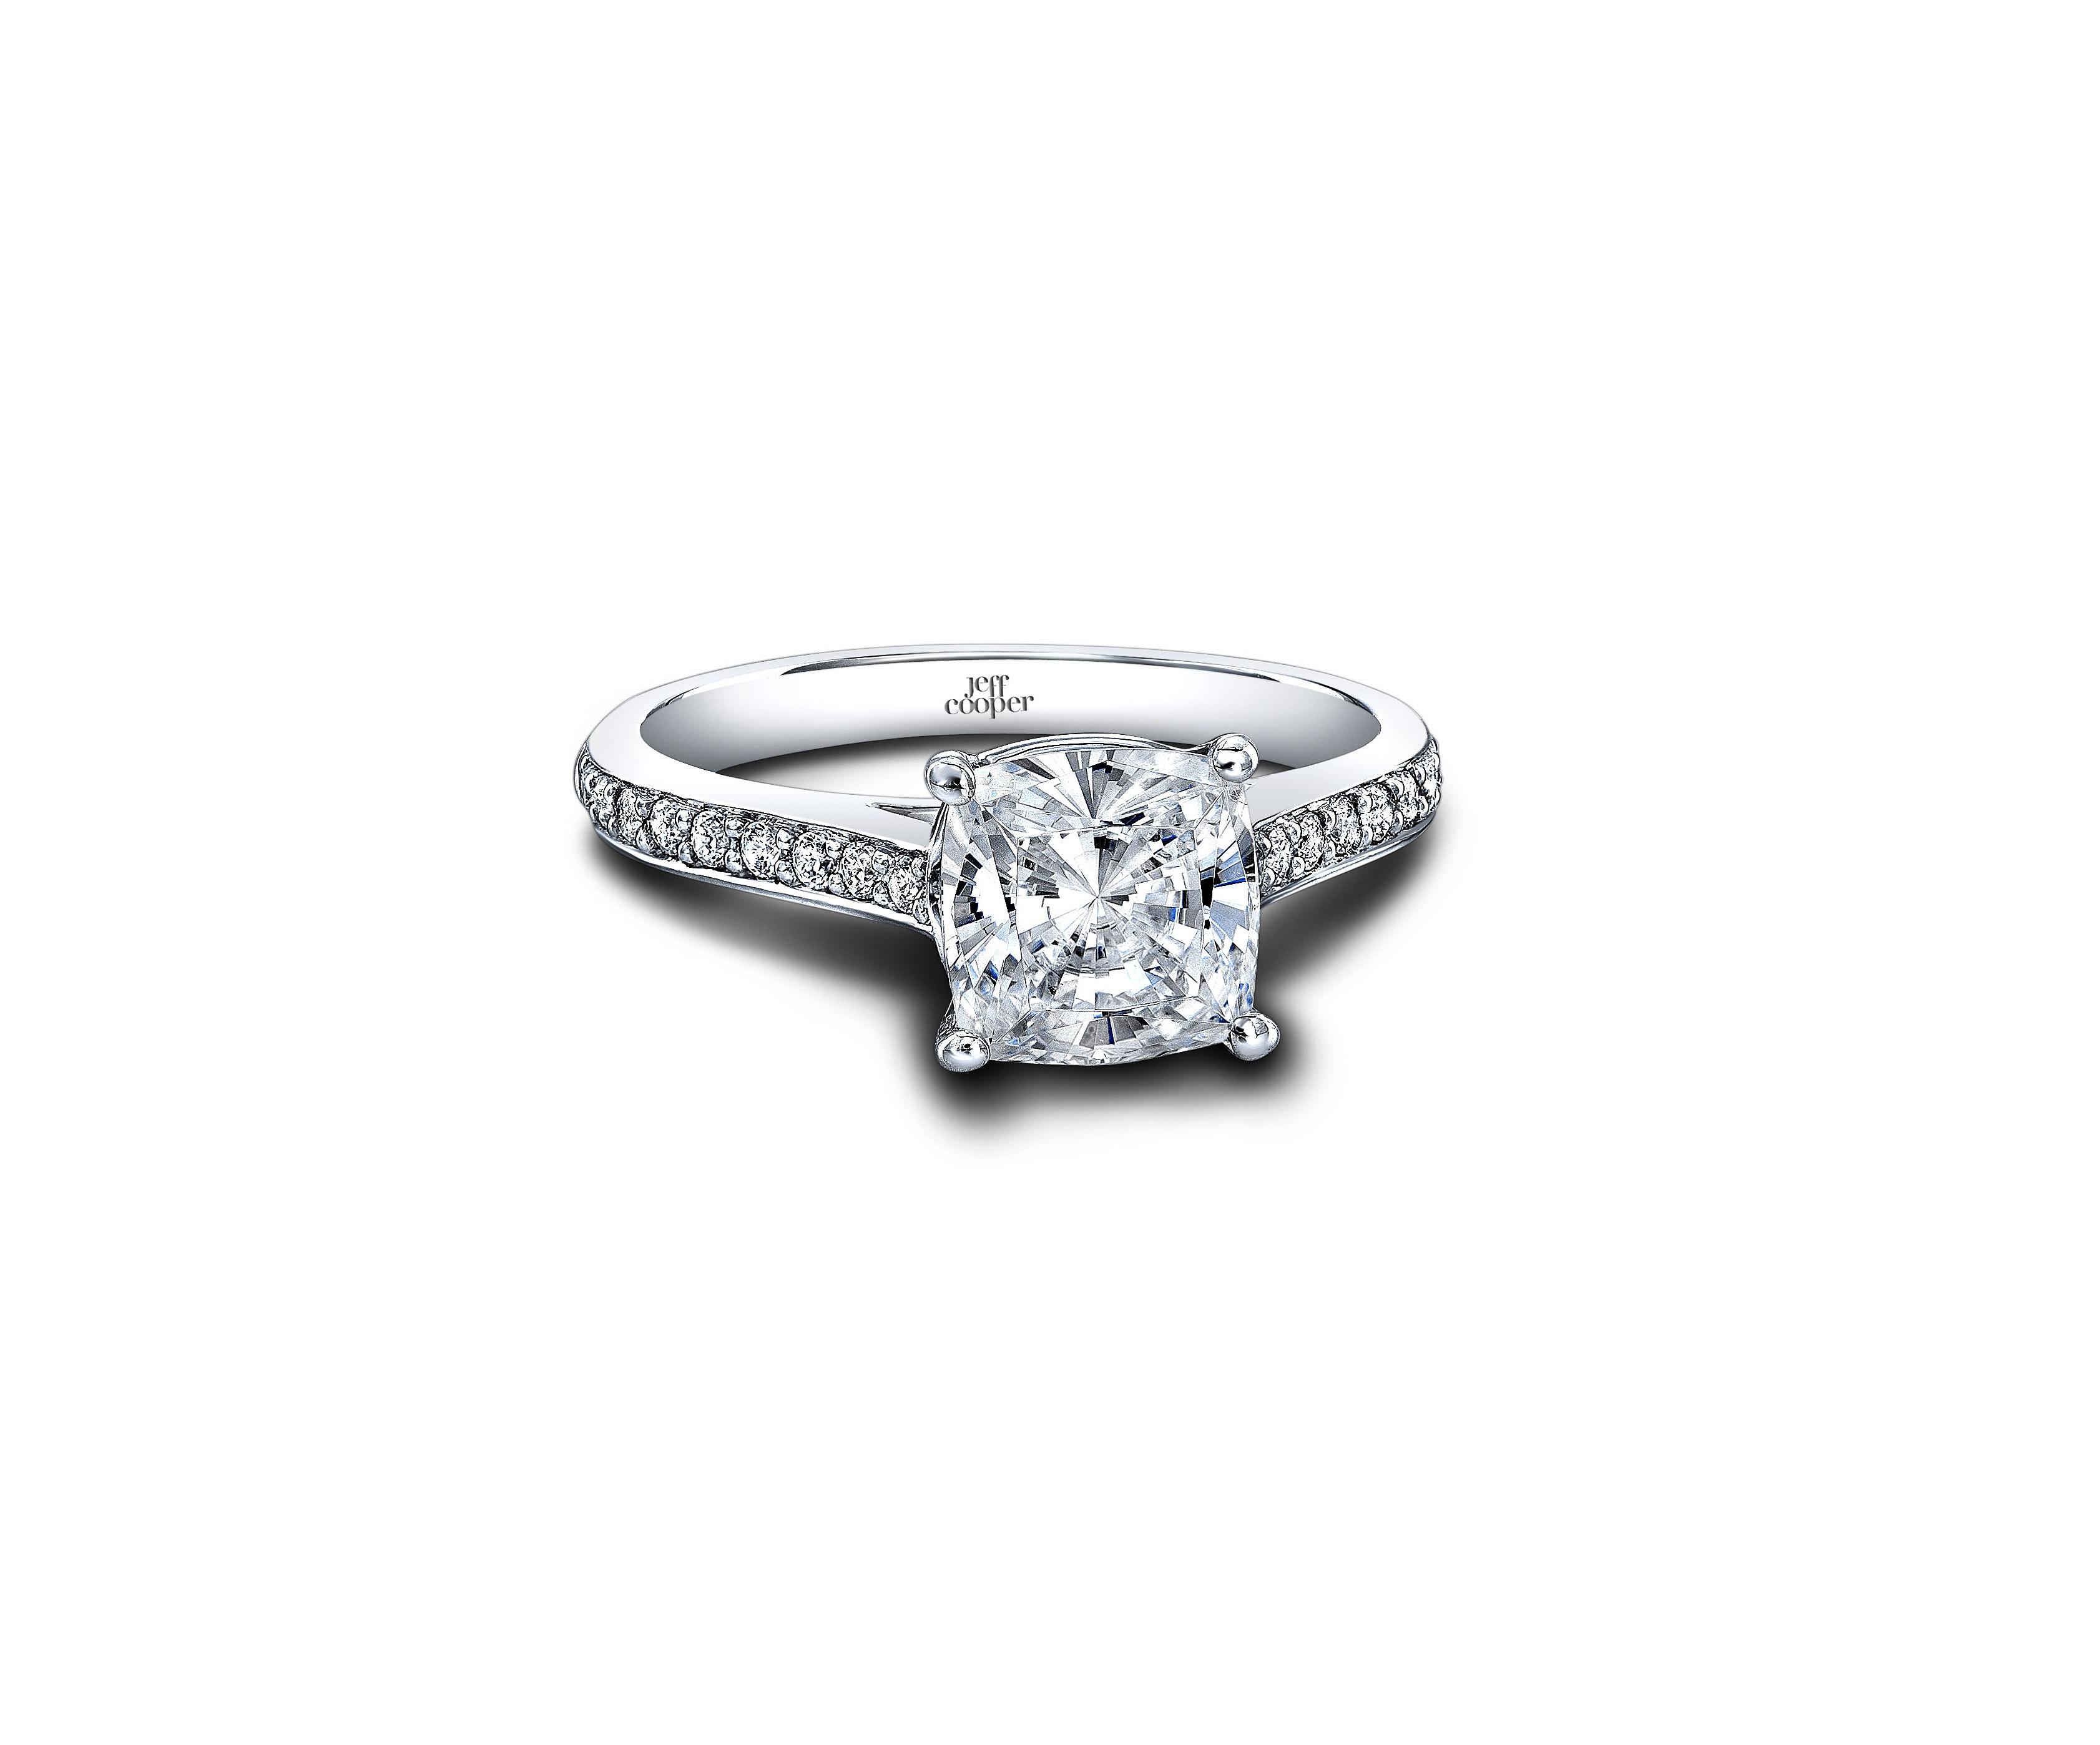 jeff cooper cushion cut diamond shank engagement ring